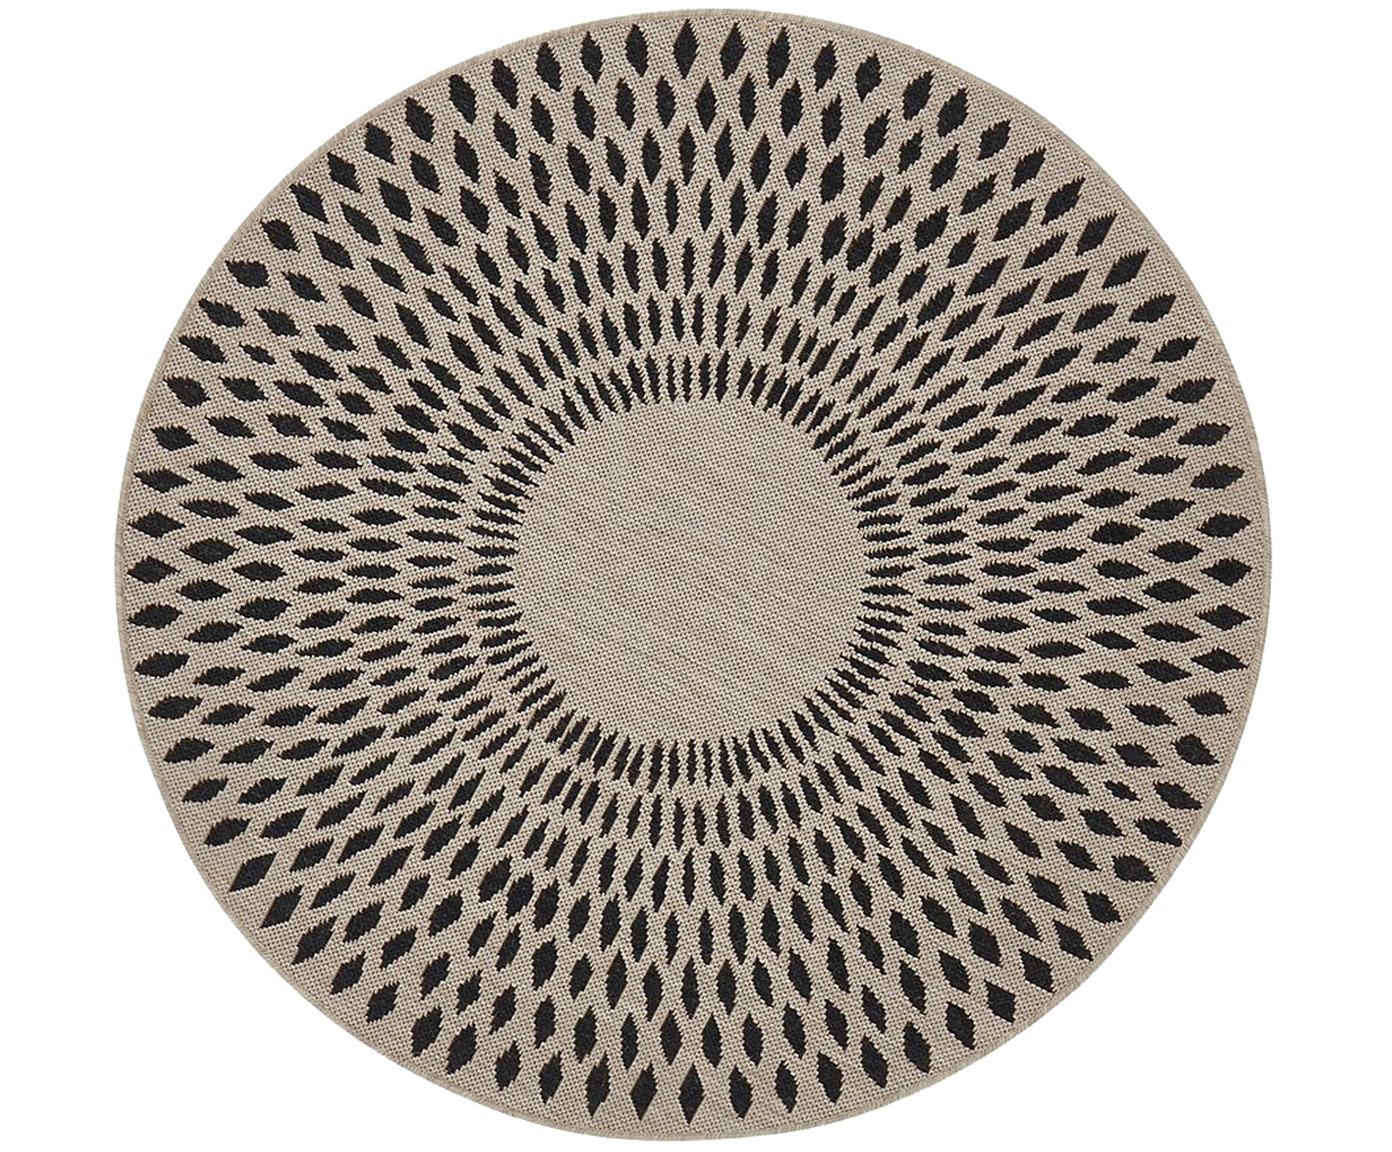 Alfombra redonda de interior/exterior Agna, 90%polipropileno, 10%poliéster, Color arena, gris antracita, Ø 120 cm (Tamaño S)